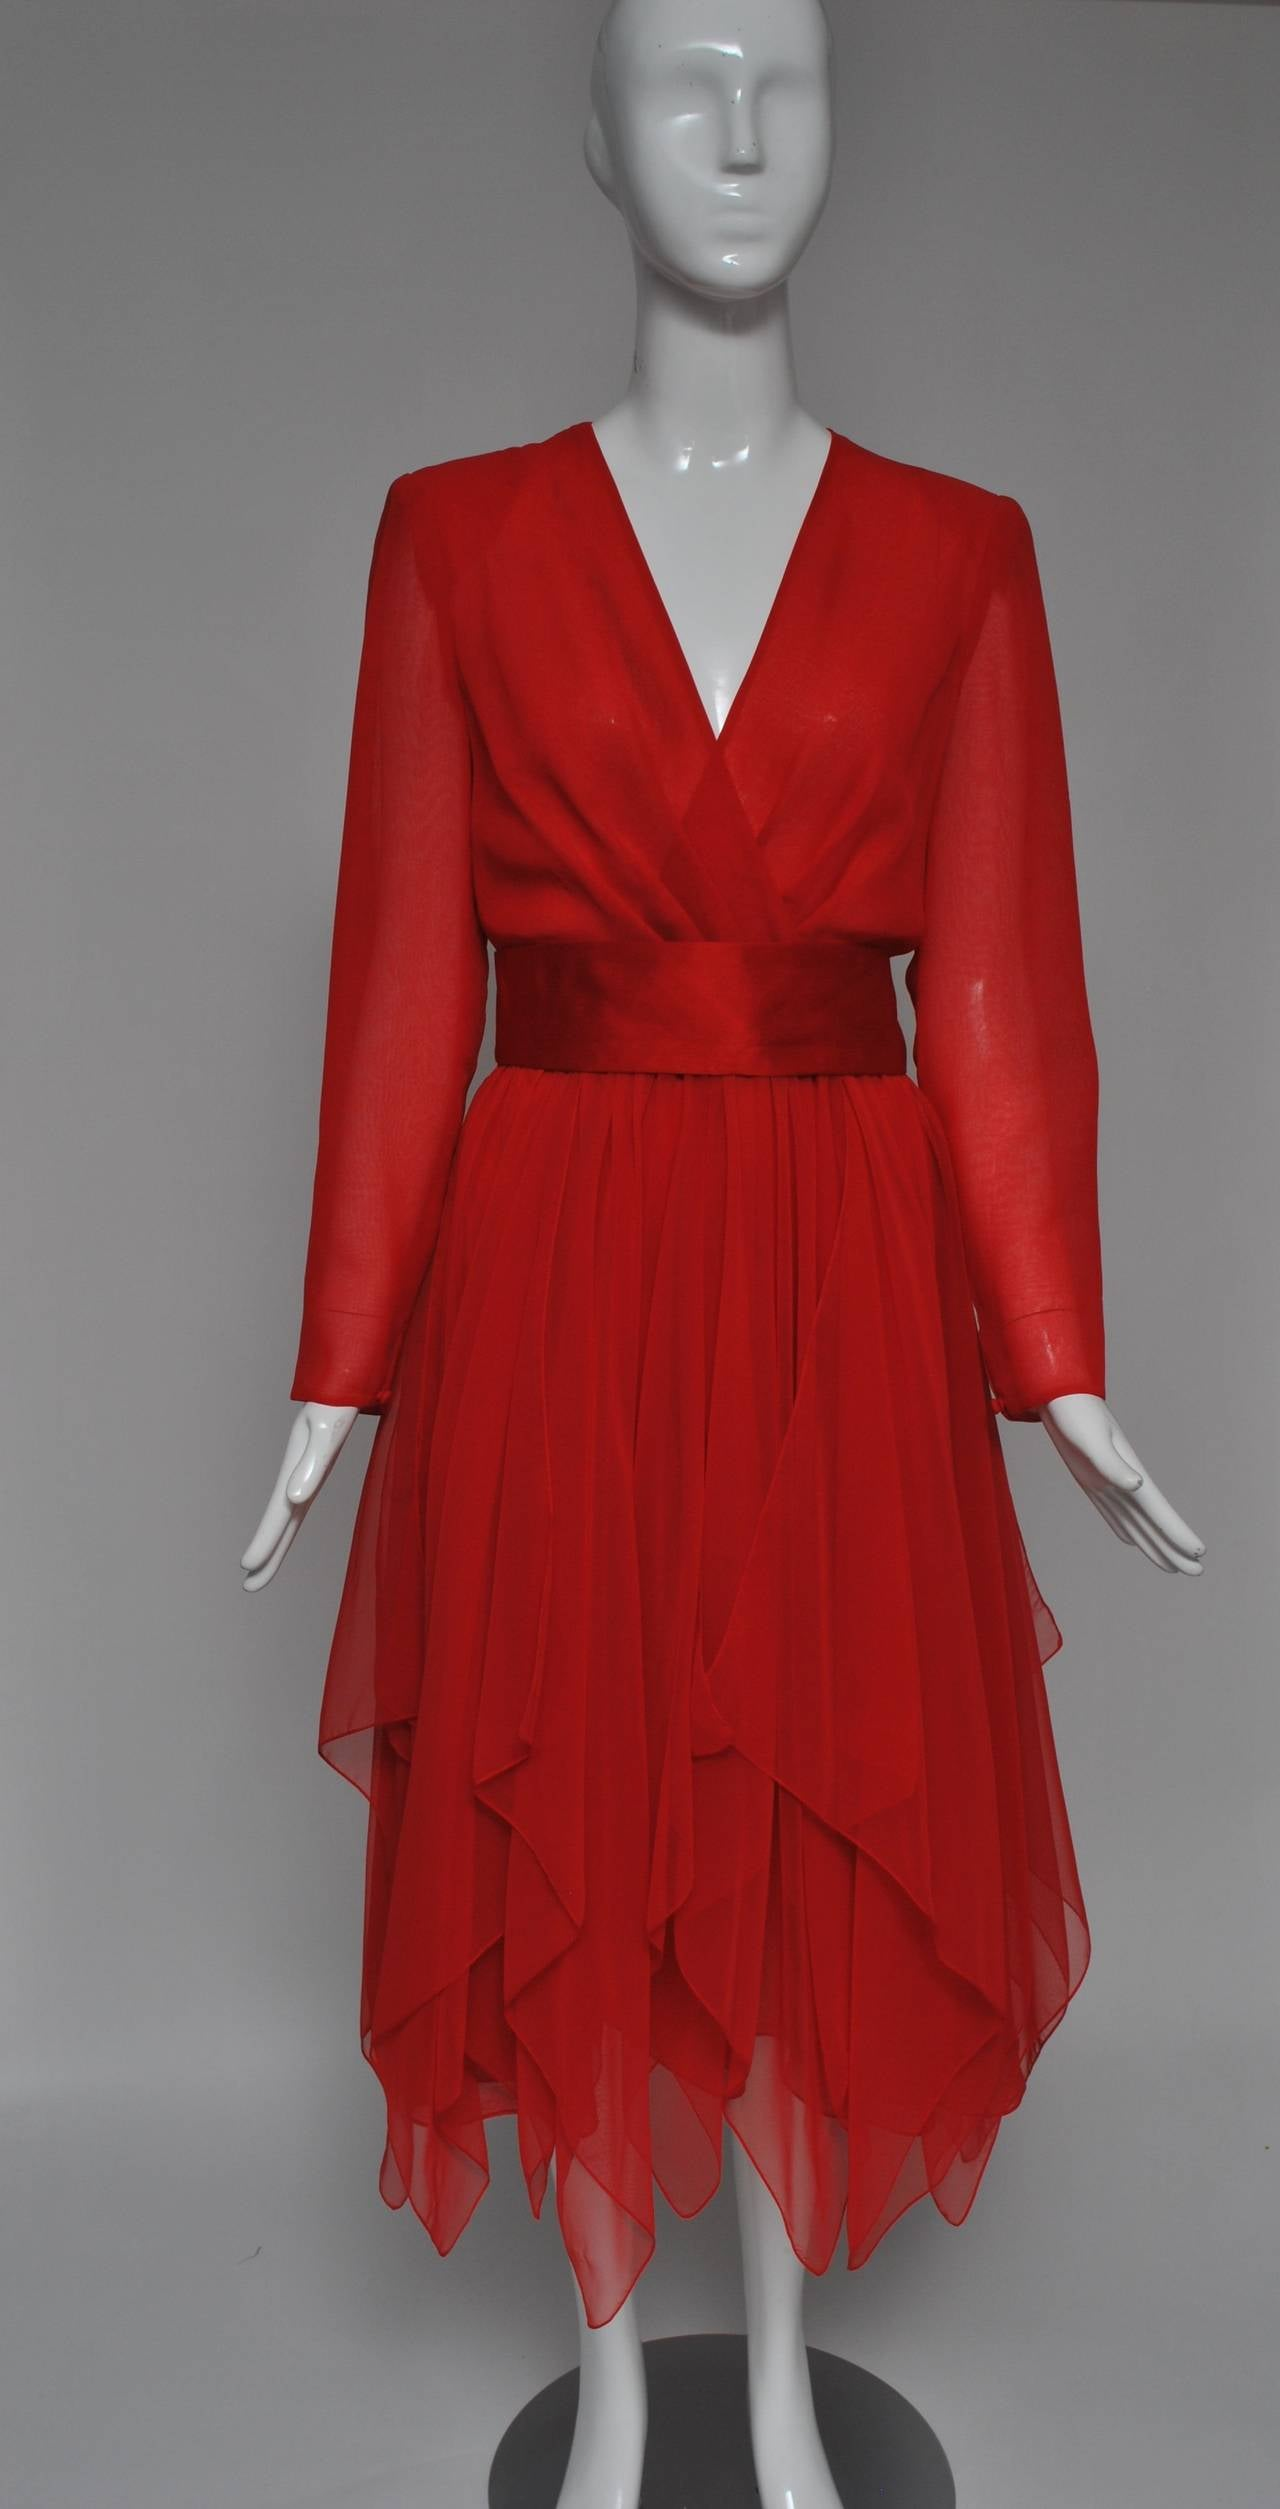 Estevez Red Chiffon Handkerchief Dress 6